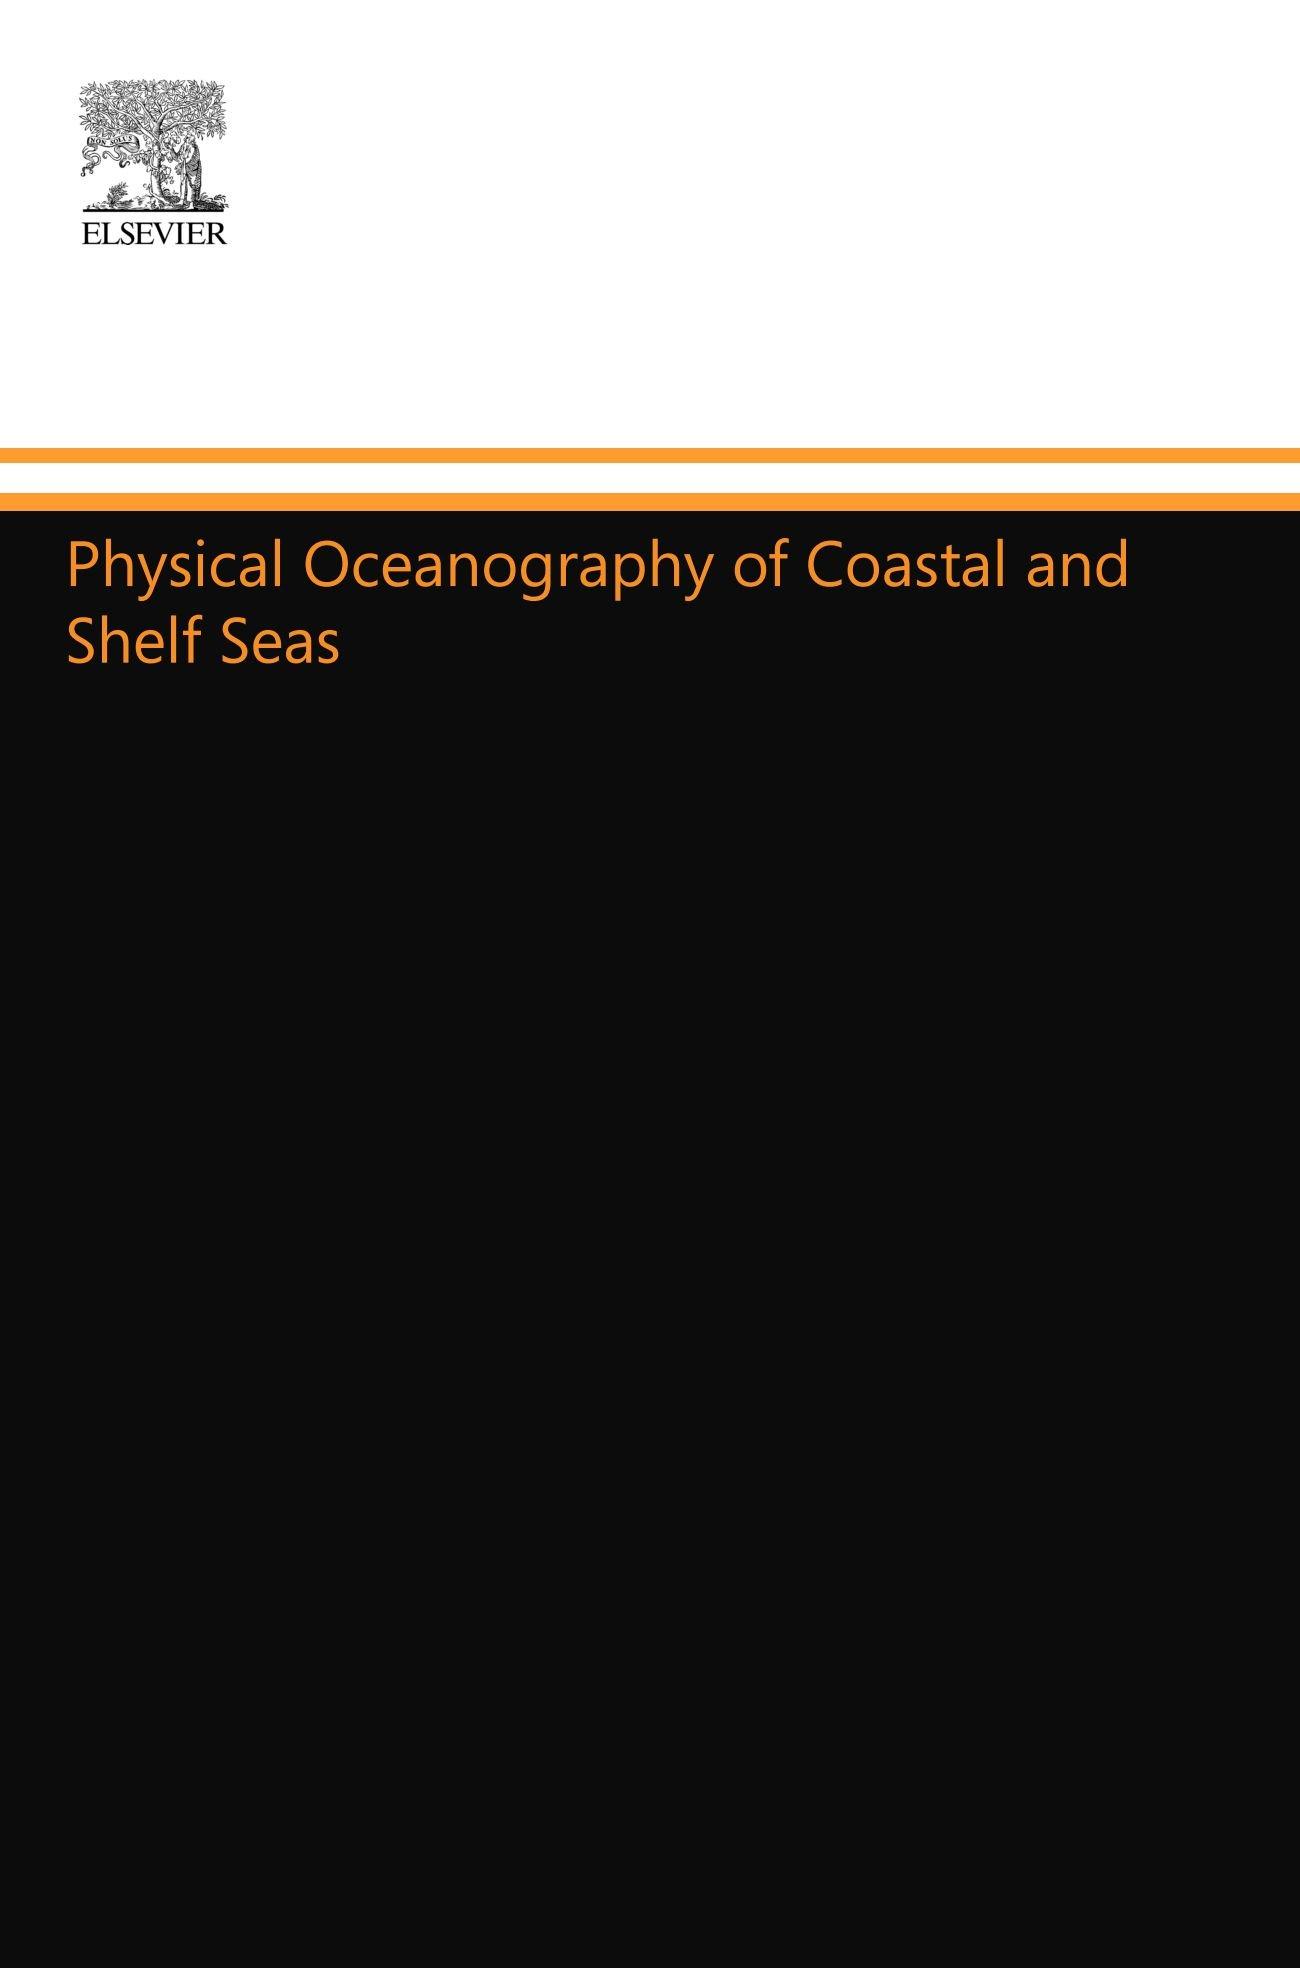 Download Physical Oceanography of Coastal and Shelf Seas ebook